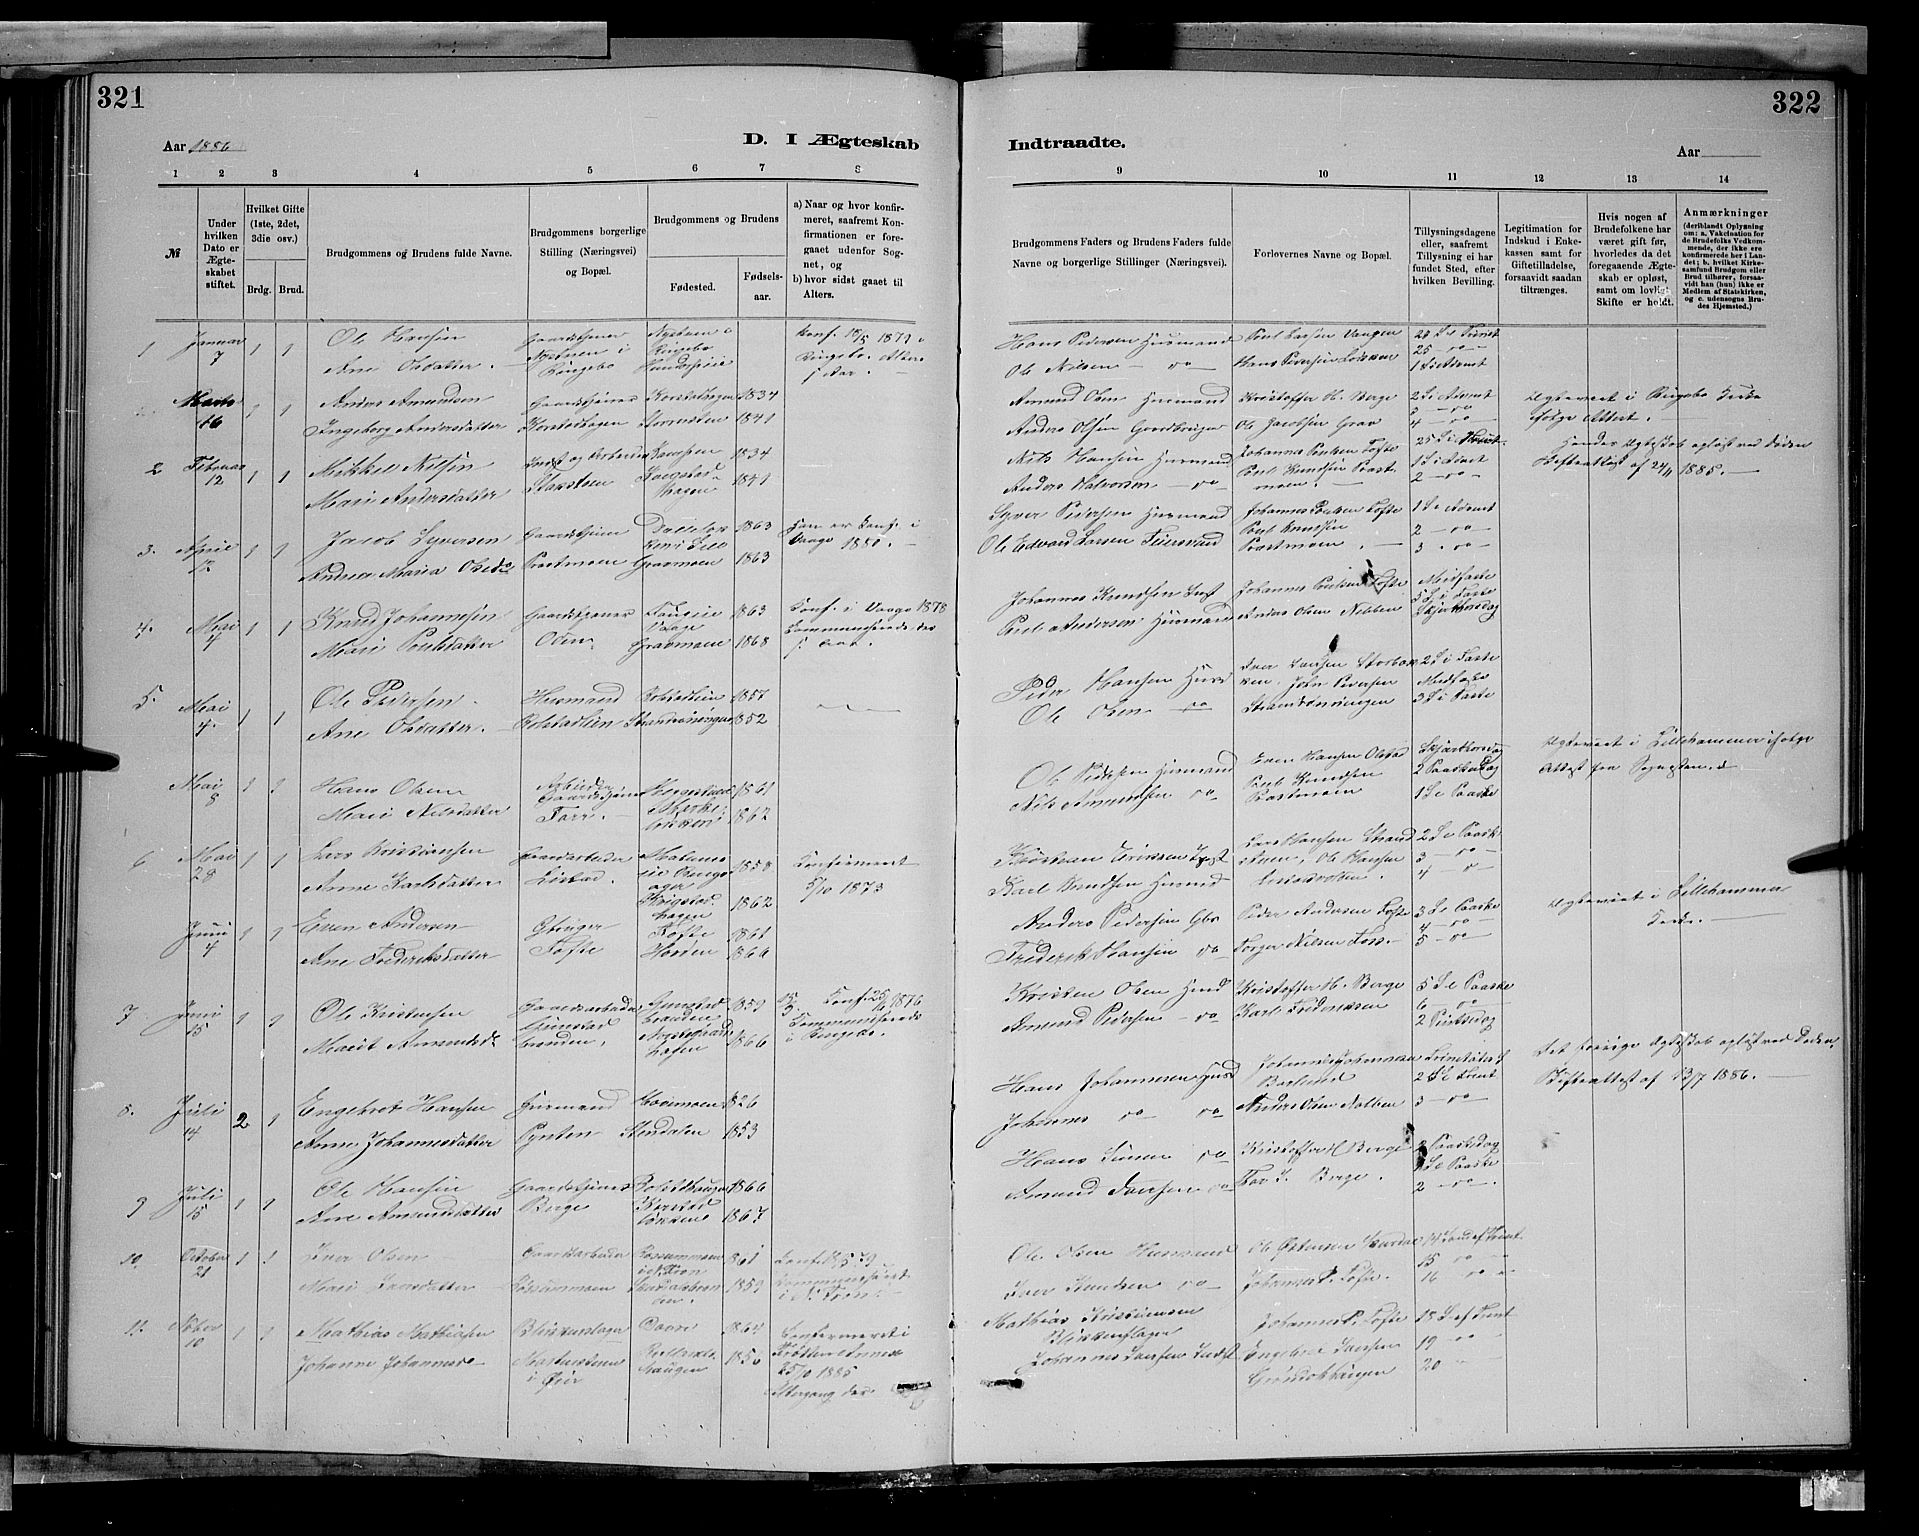 SAH, Sør-Fron prestekontor, H/Ha/Hab/L0003: Klokkerbok nr. 3, 1884-1896, s. 321-322